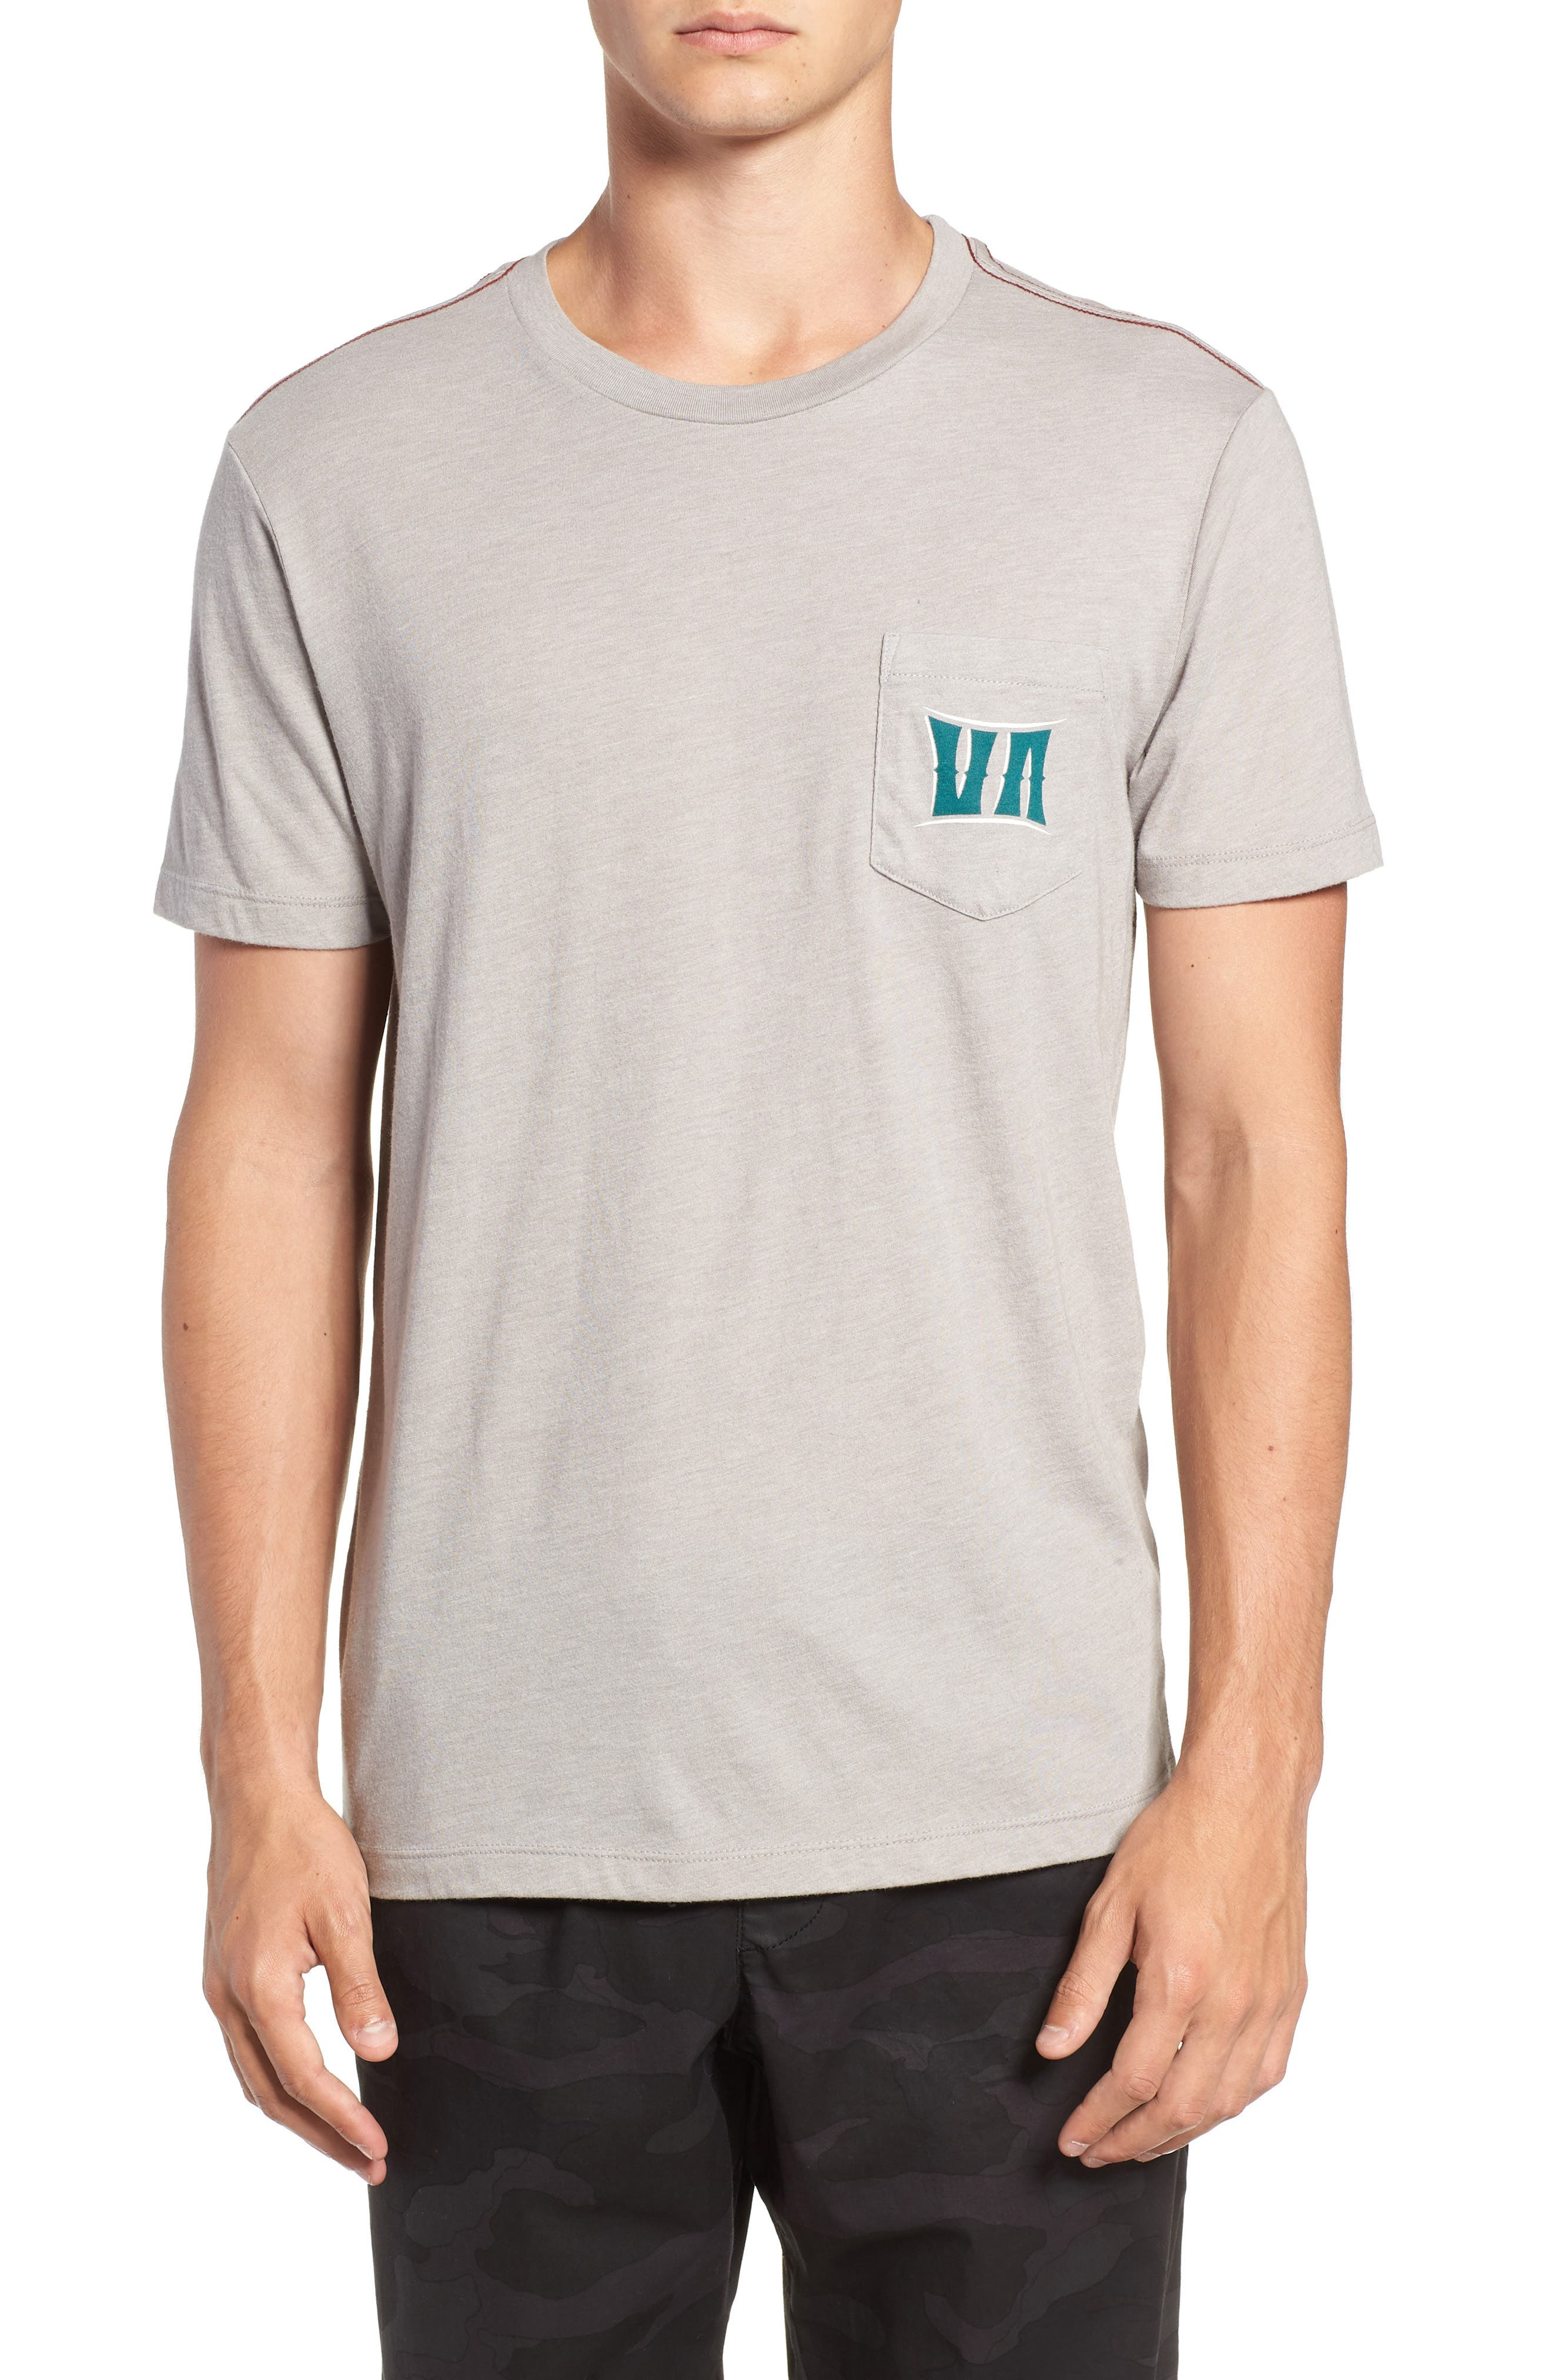 Rvca Sagebrush Graphic Pocket T-Shirt, Grey